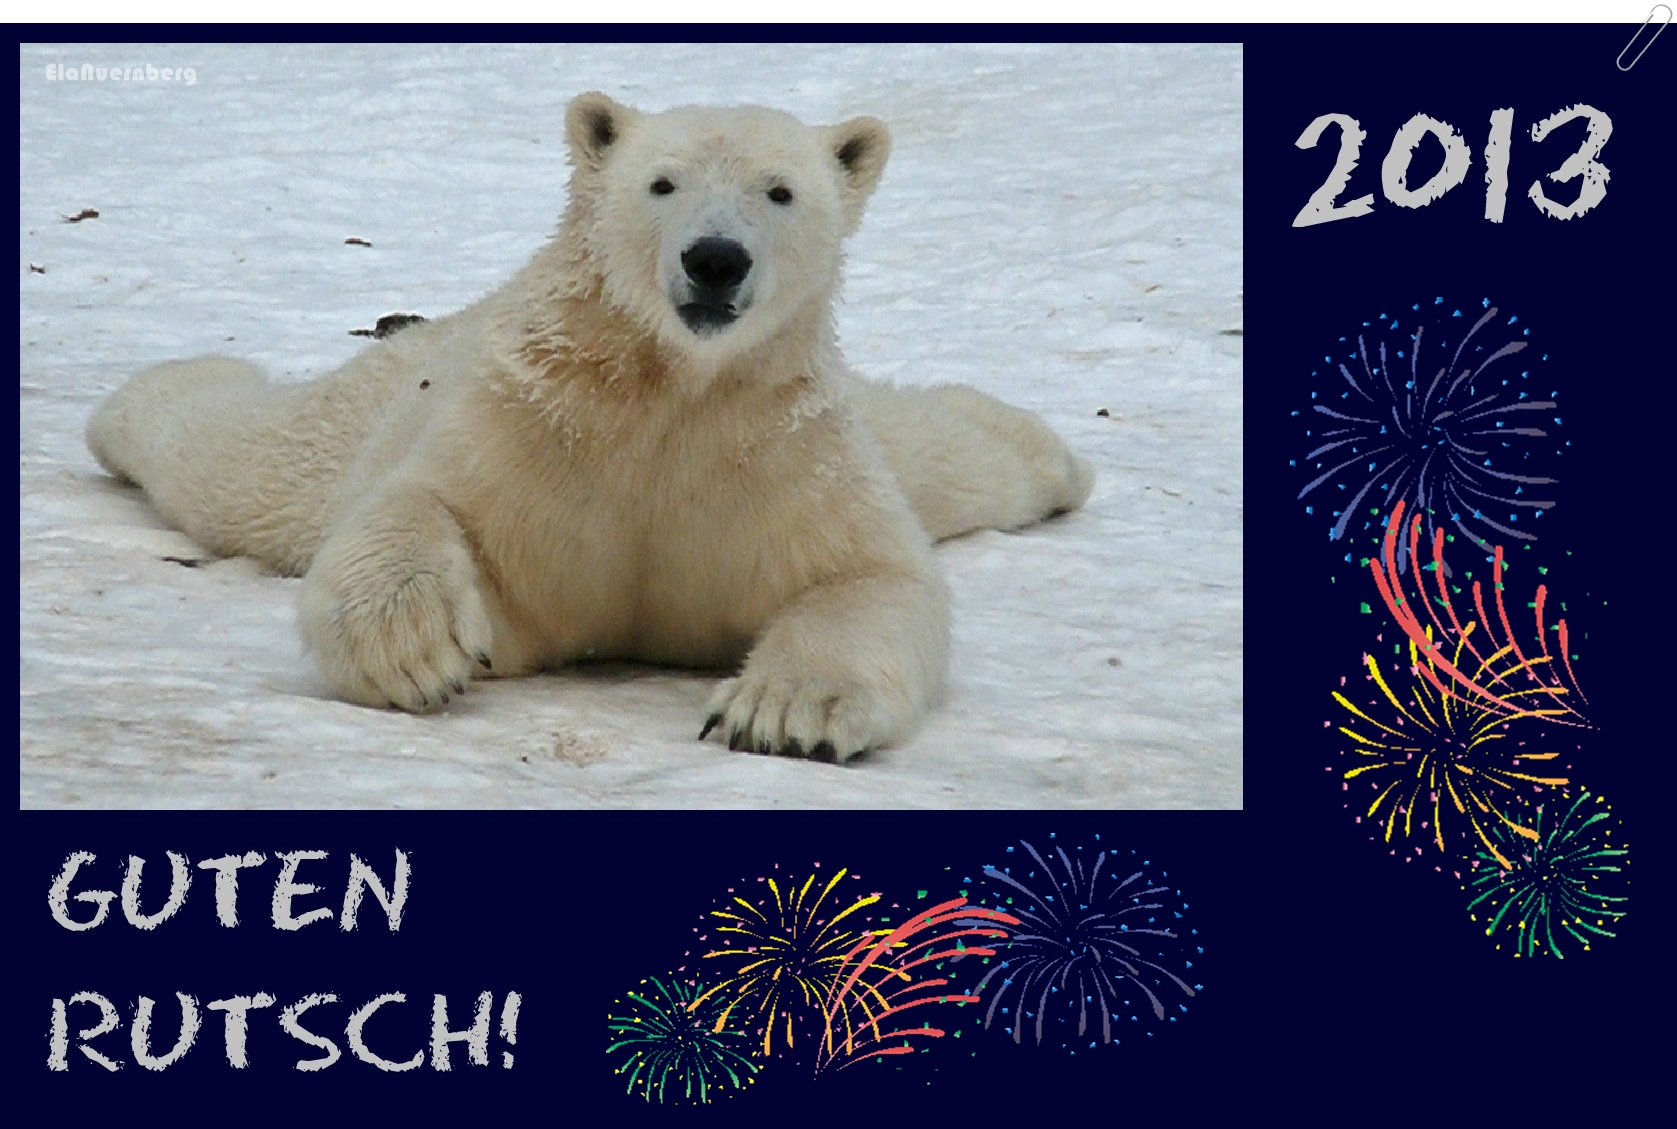 Guten Rutsch 2013 - Eisbär GREGOR - Tiergarten Nürnberg - 12/2012